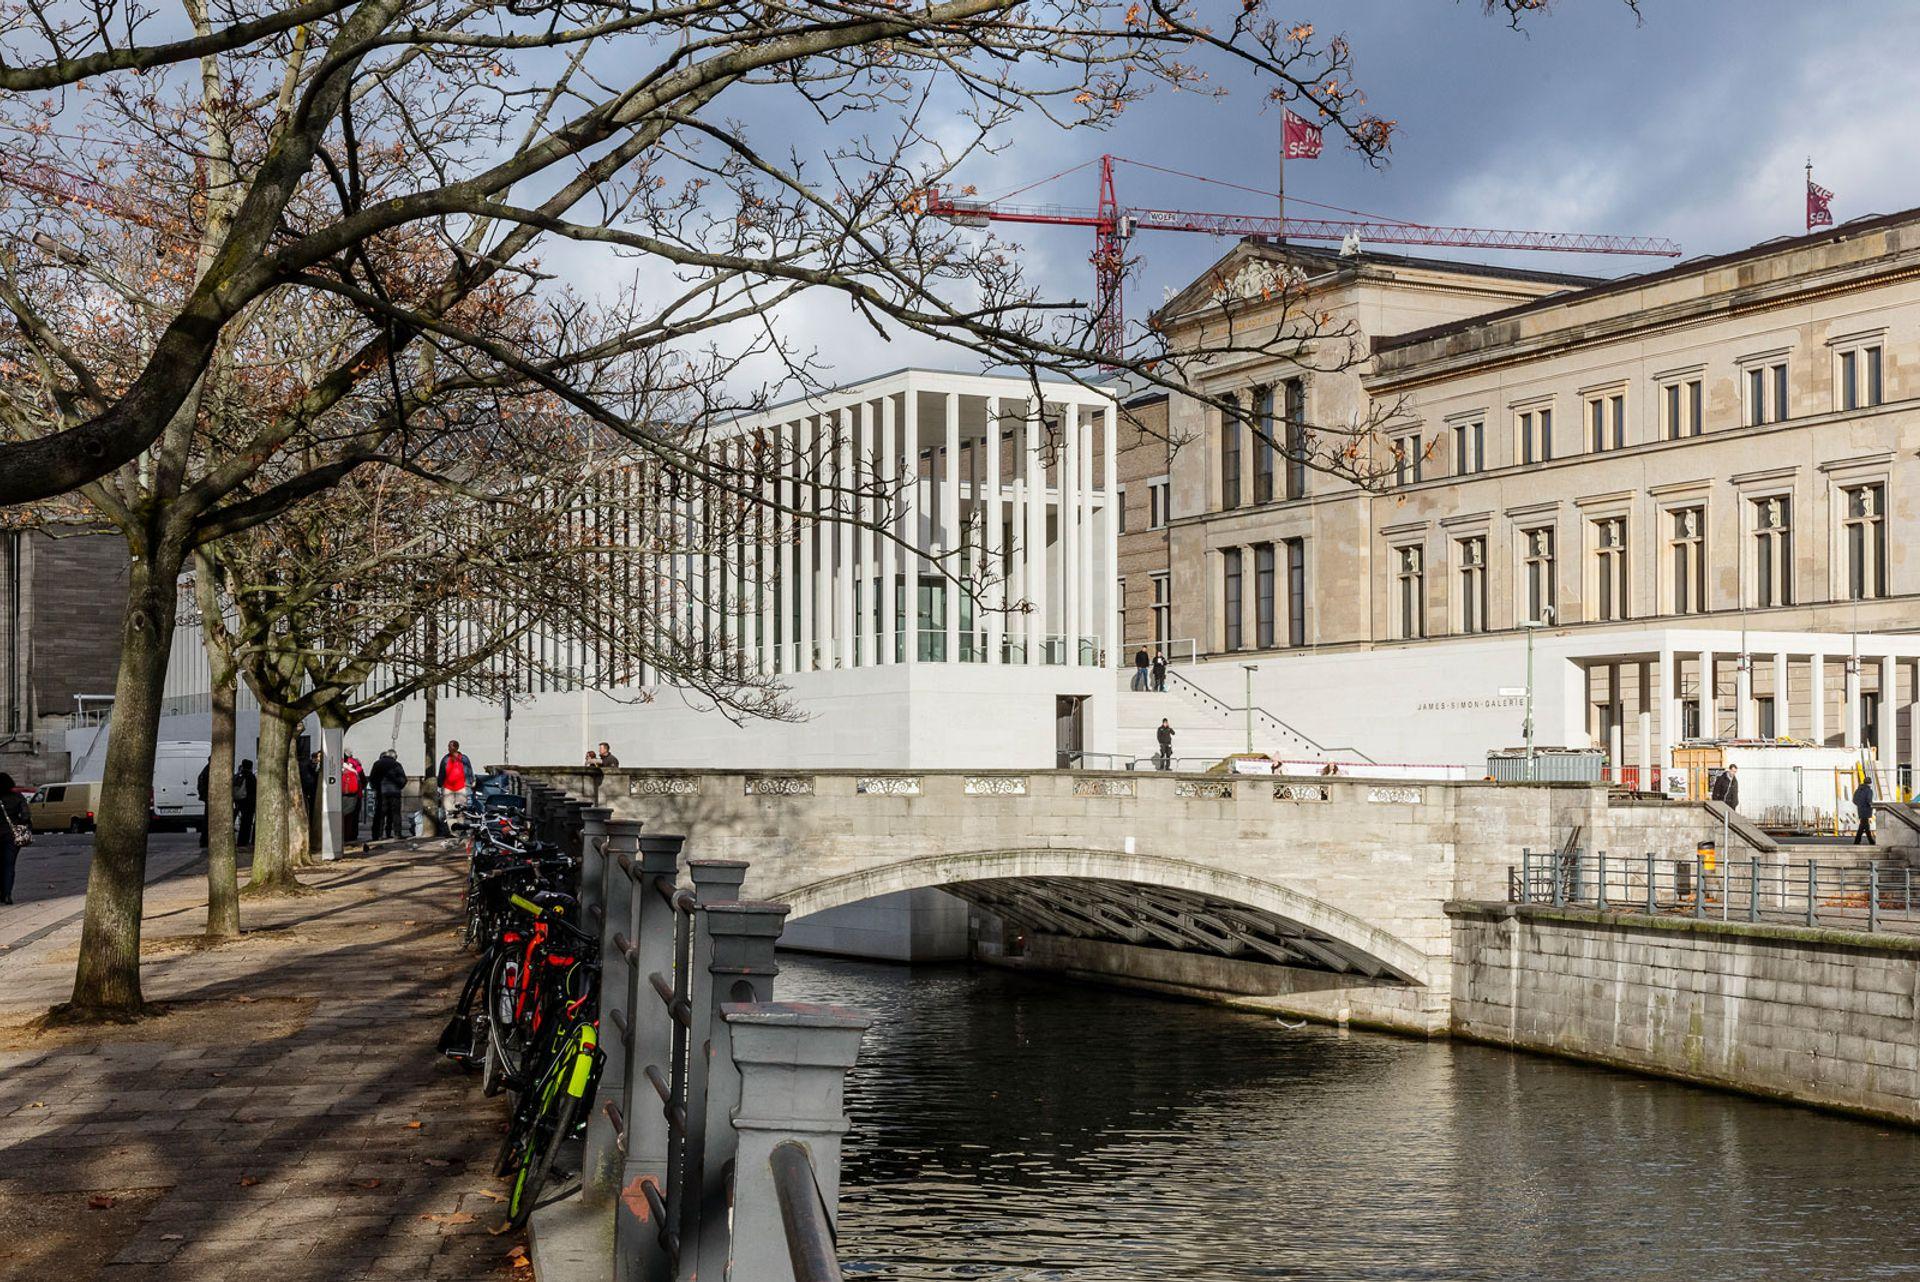 James Simon Galerie © David Chipperfield Architect